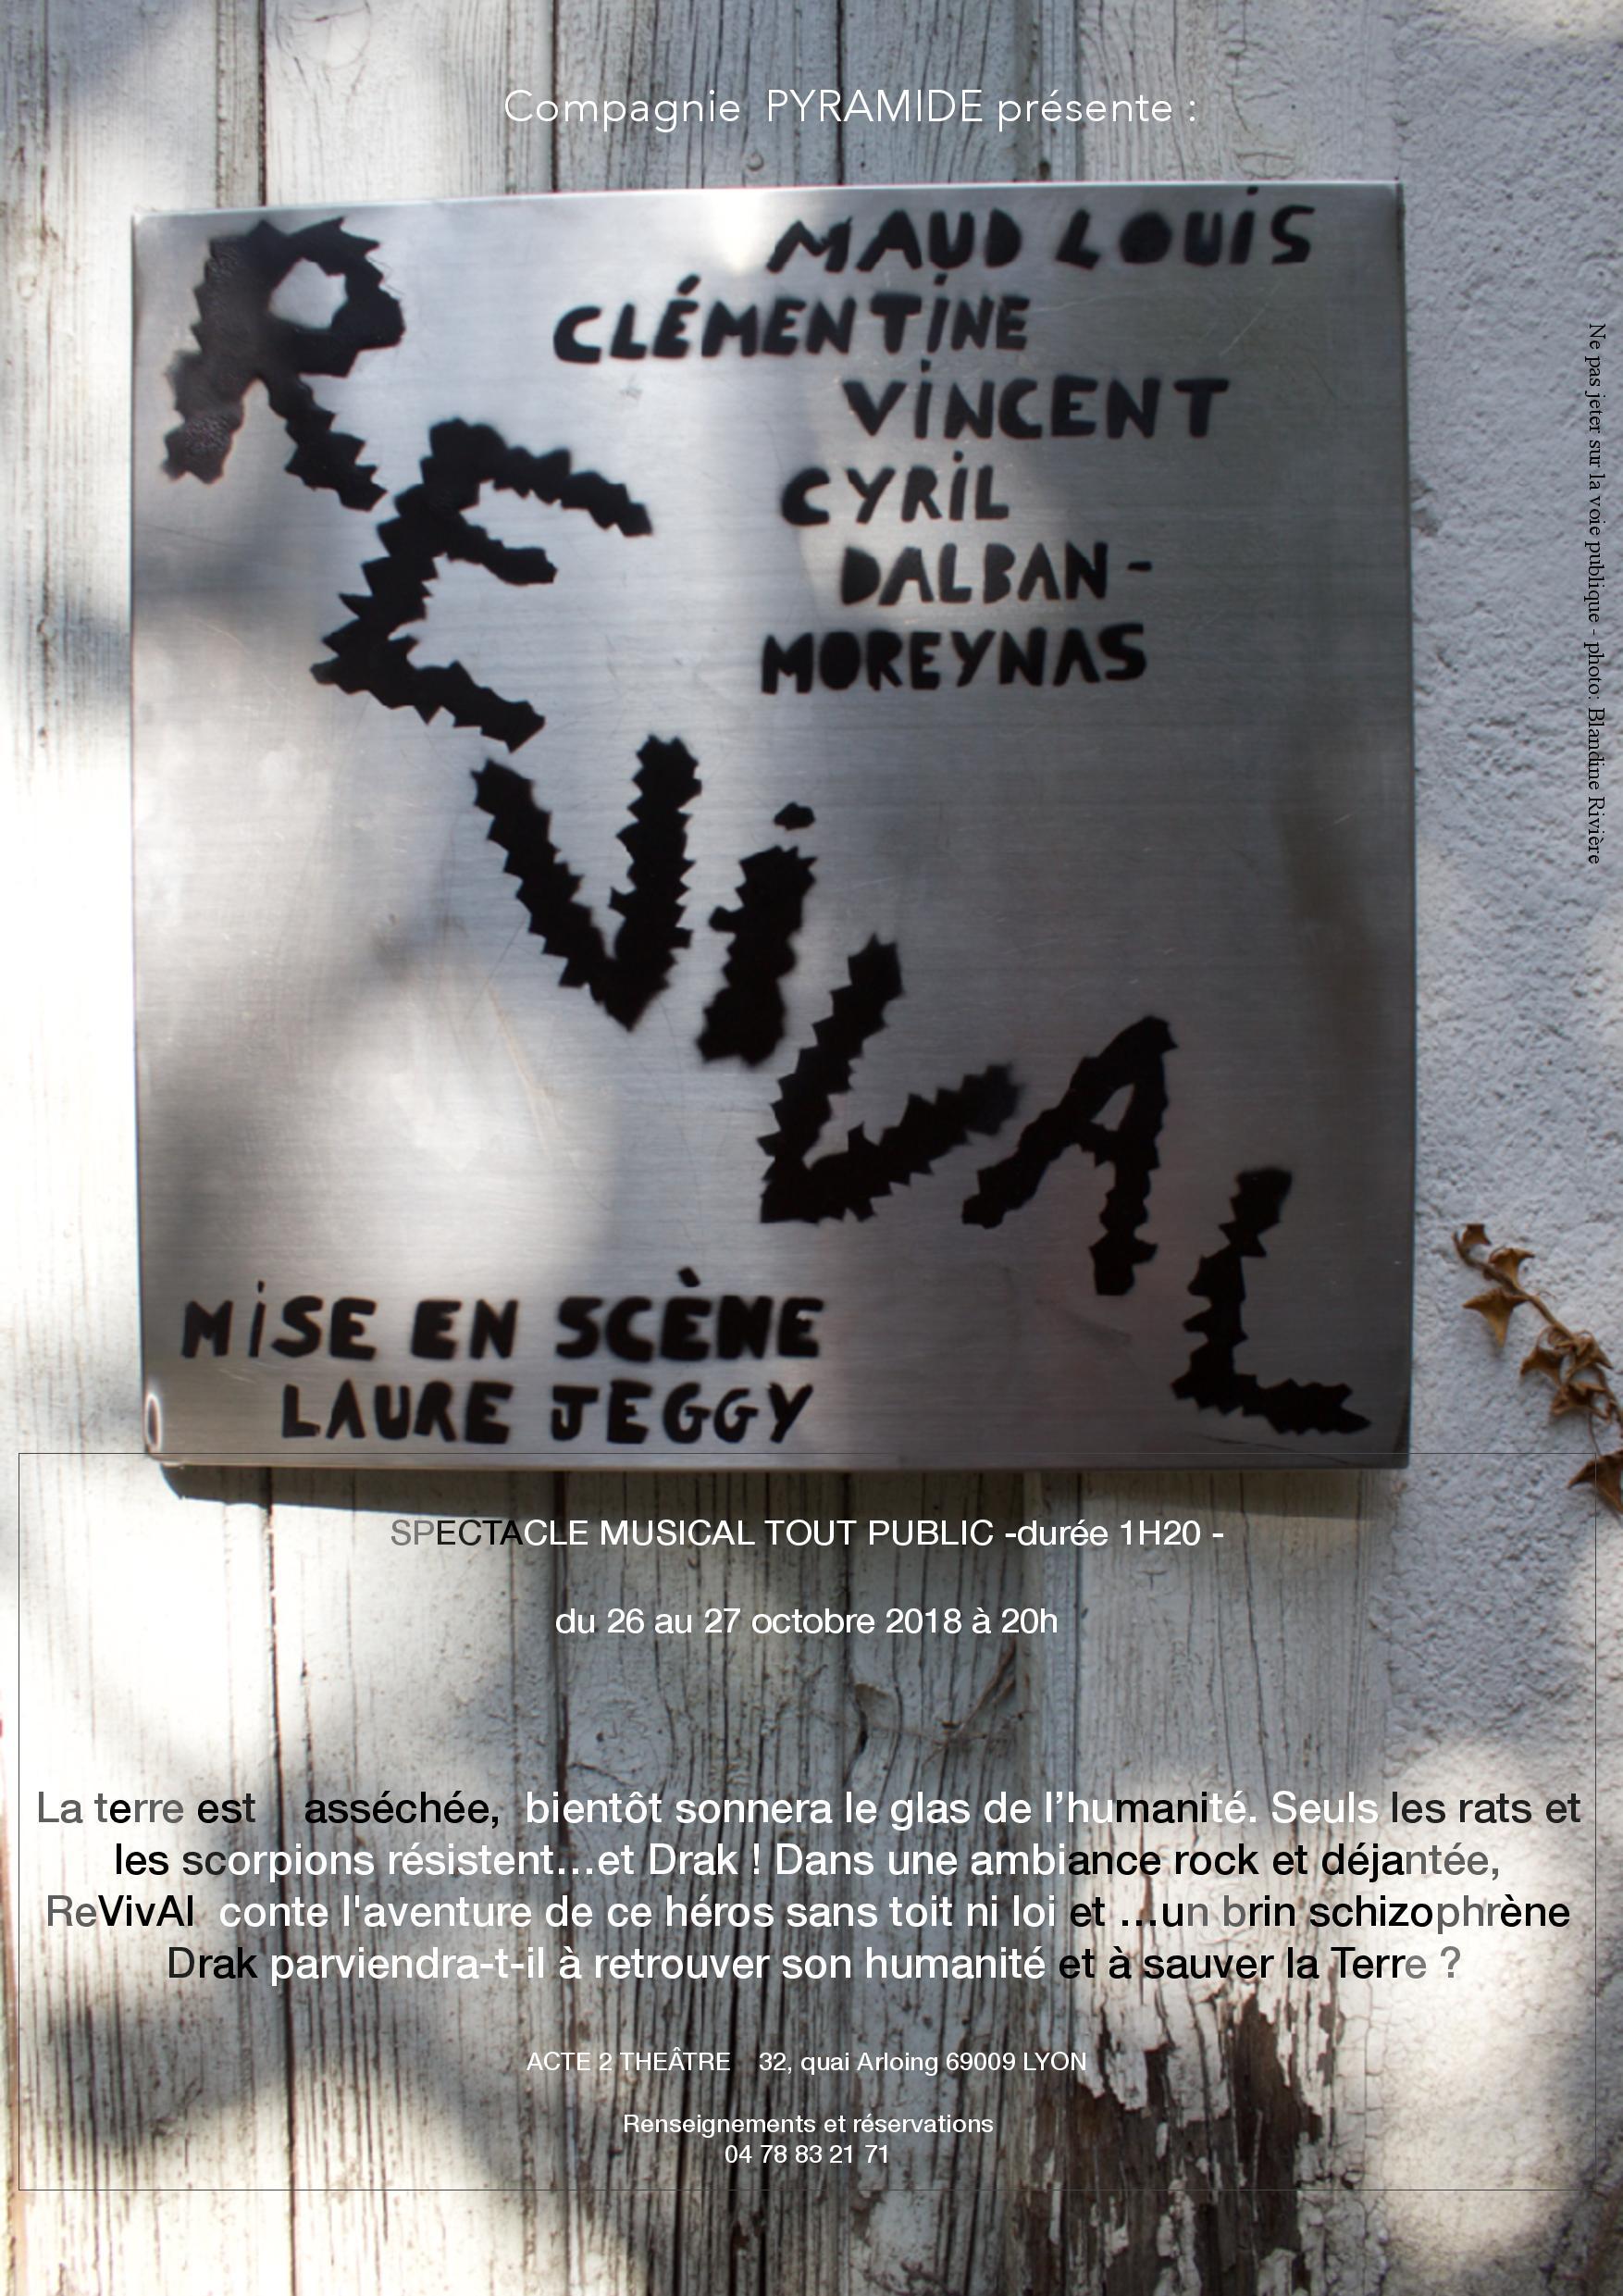 reVivAl - spectacle musical tout public  -1h20 - Cie pyramide